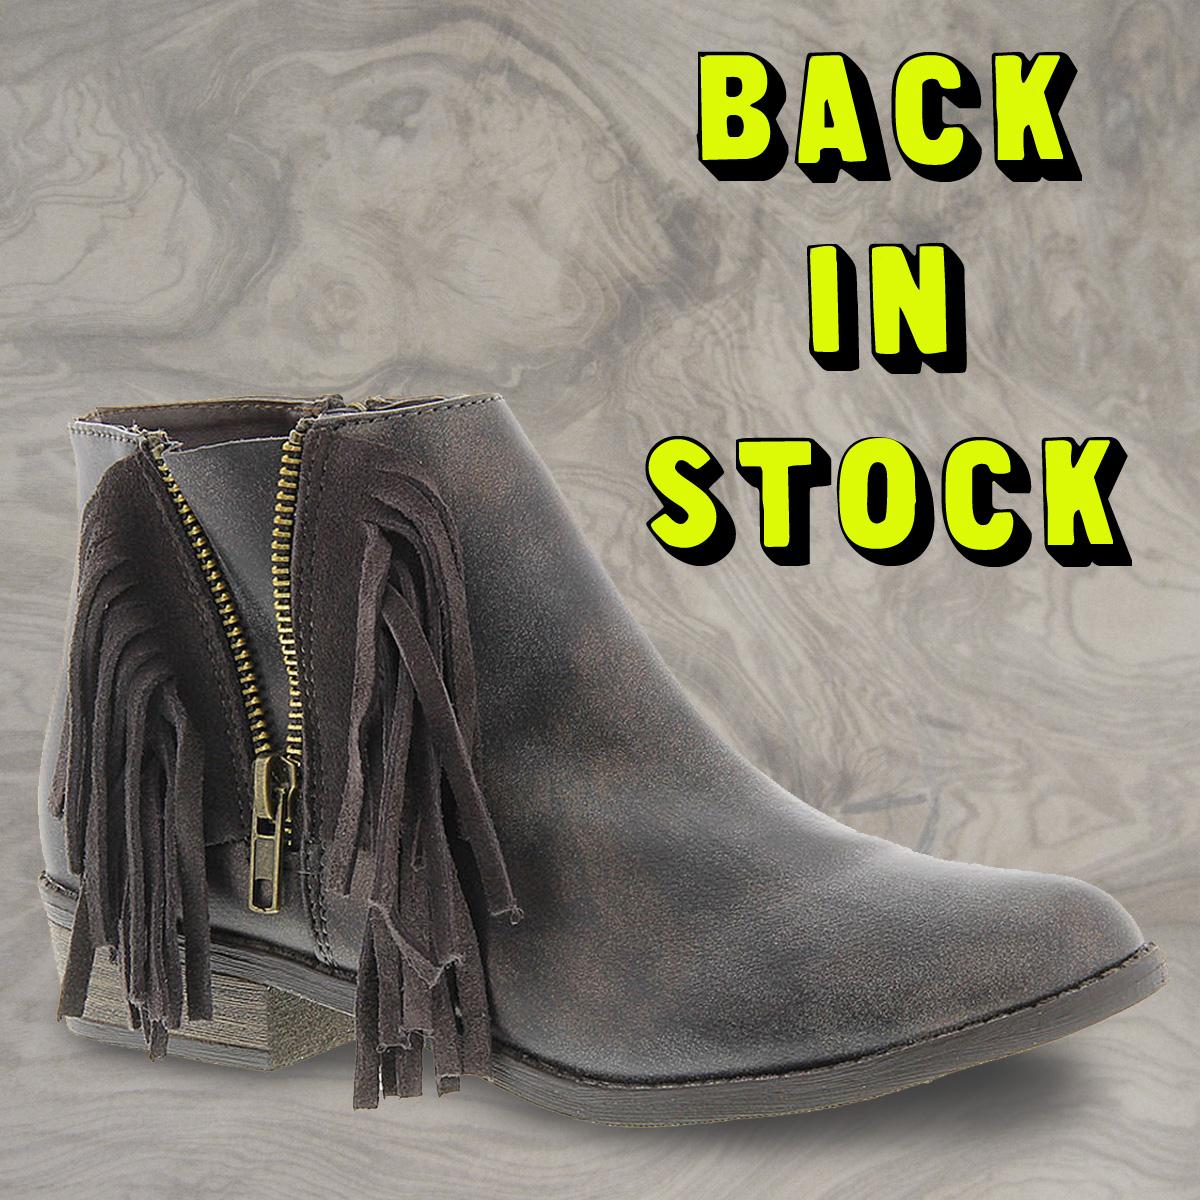 Steve Madden Fringe Bootie is back in stock